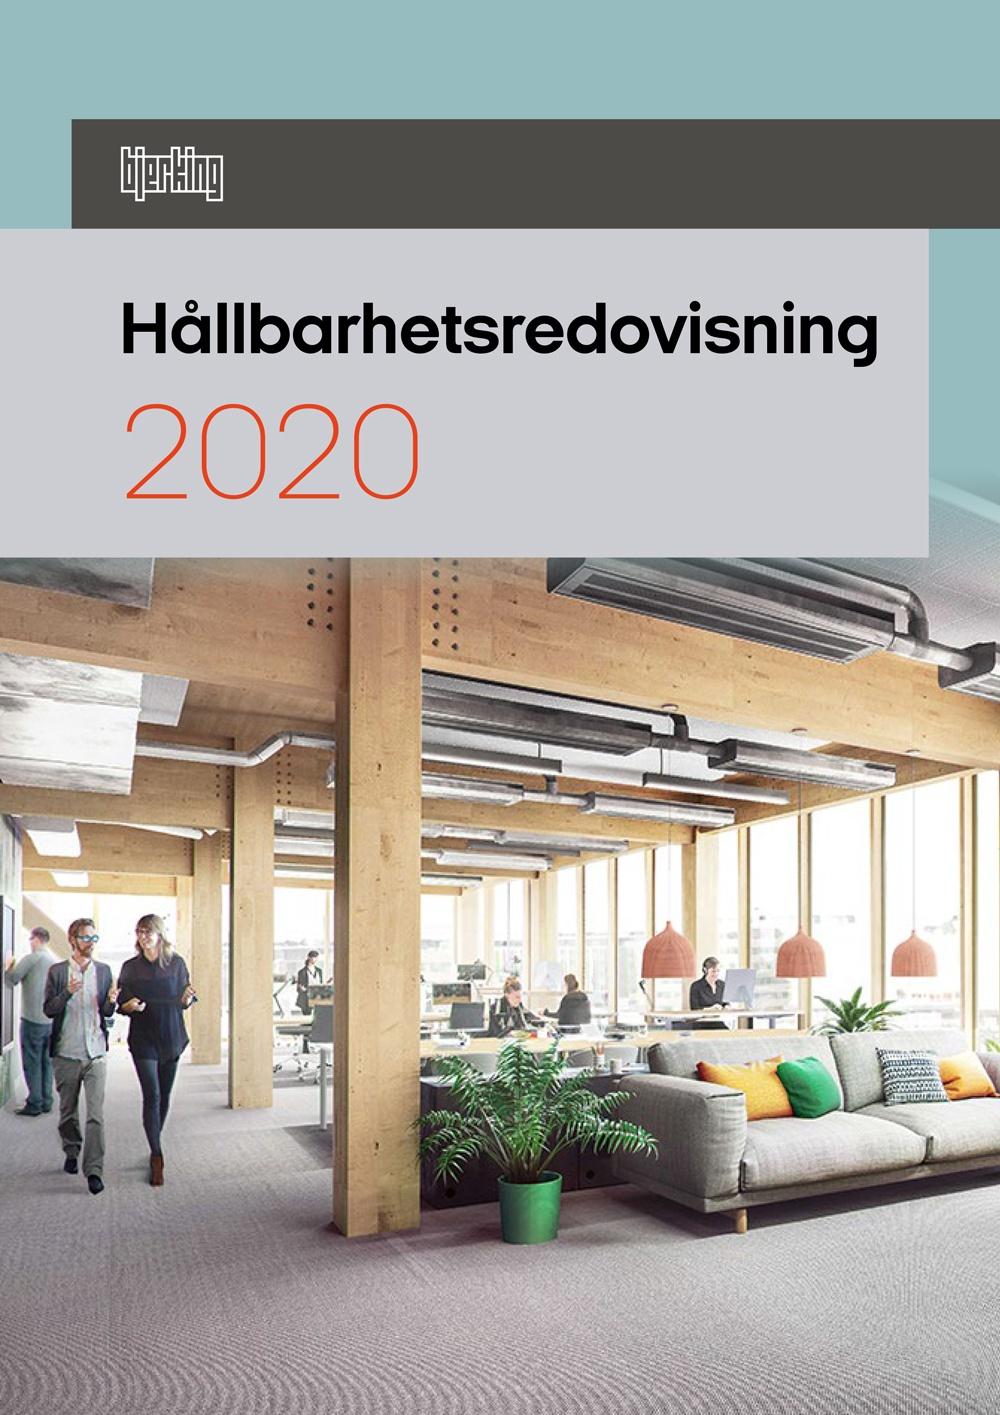 Bjerking Hållbarhetsredovisning 2020